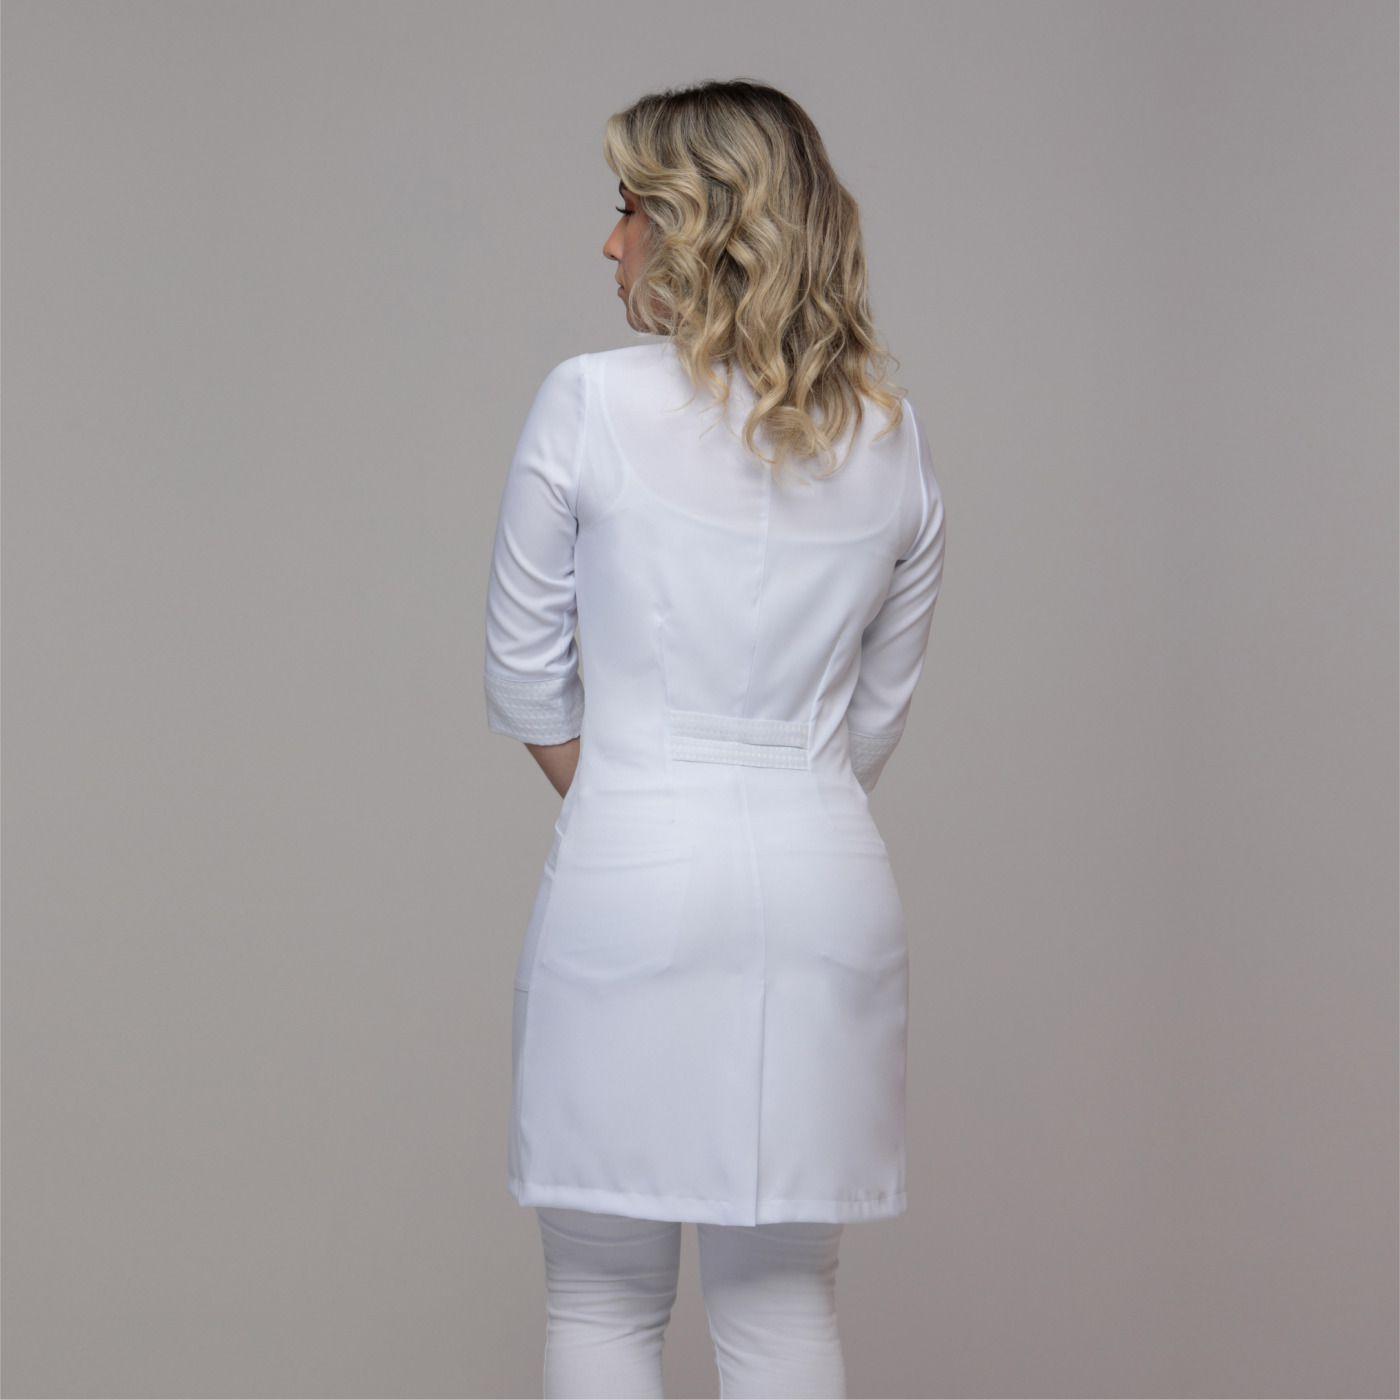 Jaleco Feminino Gola Esporte Textura